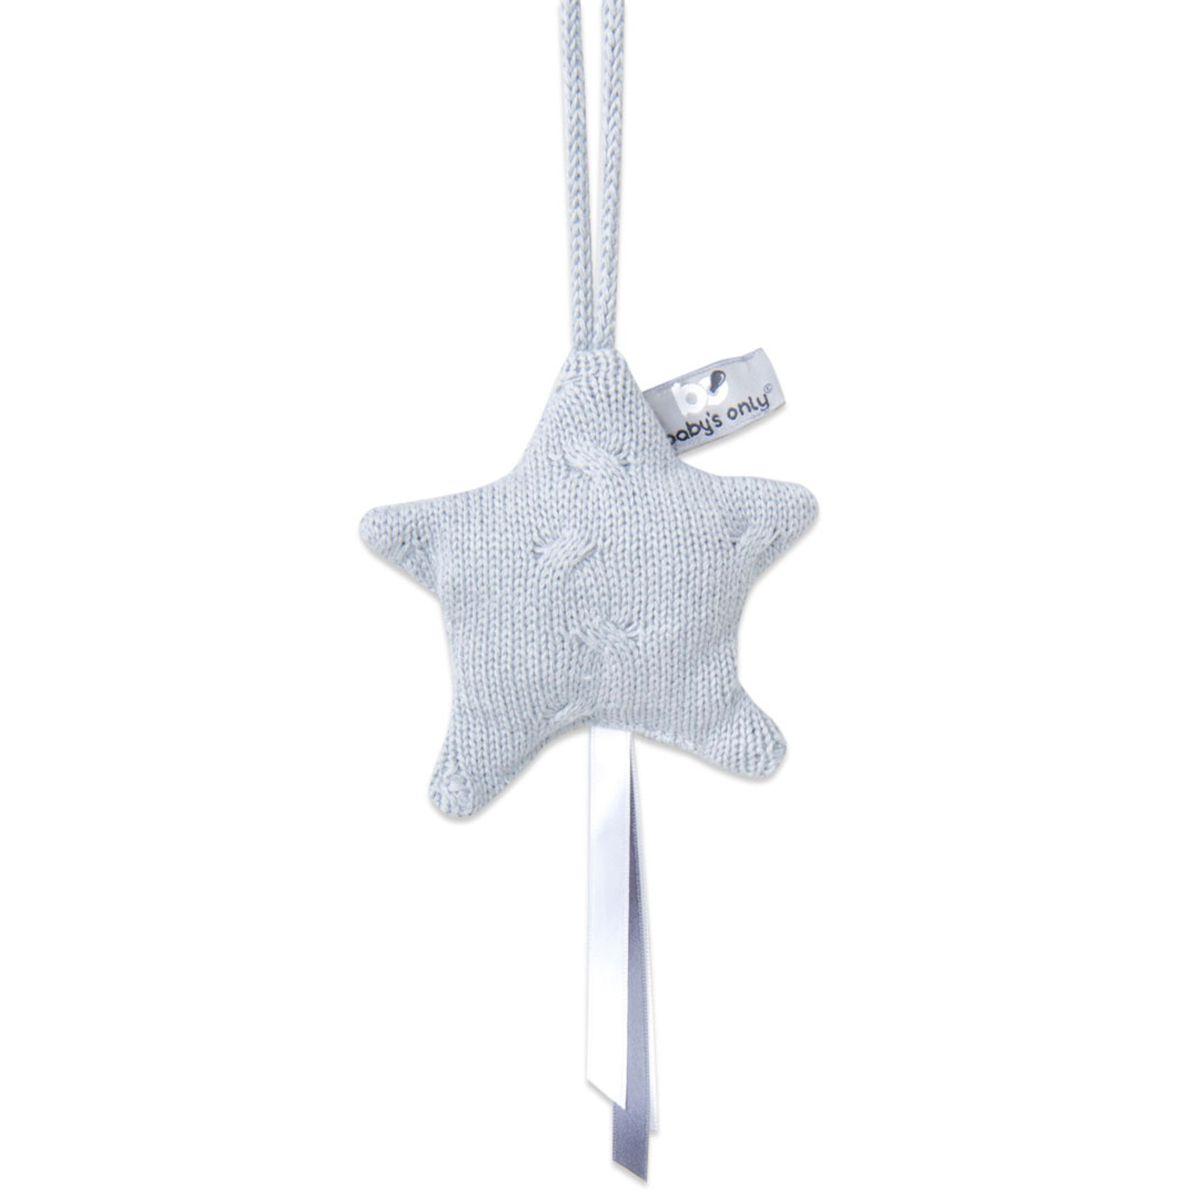 babys only 0133822 decoratiester cable grijs